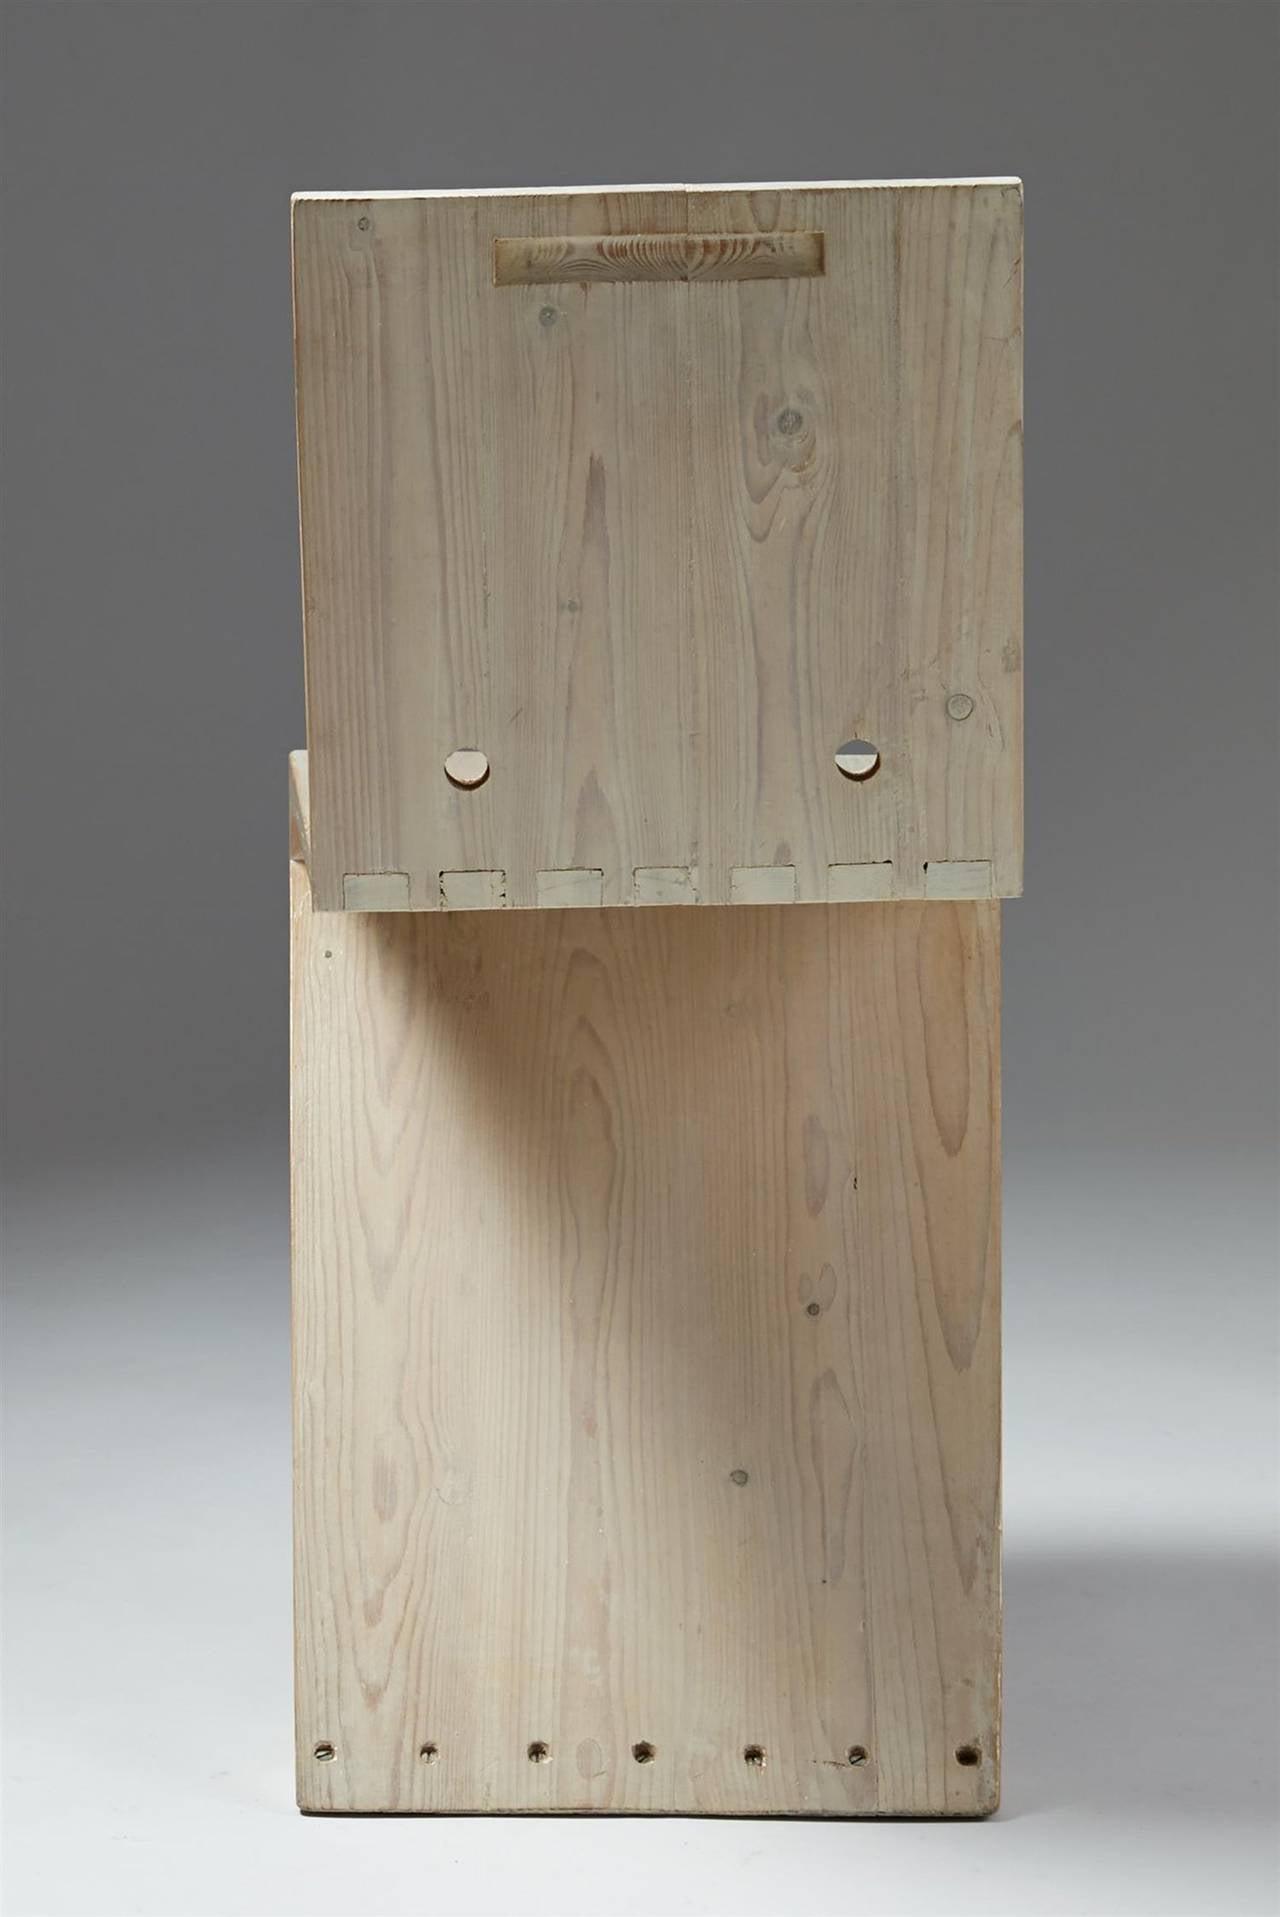 Dutch Zig Zag Chair Designed by Gerrit Rietveld for G.A. van de Groenekan, Holland